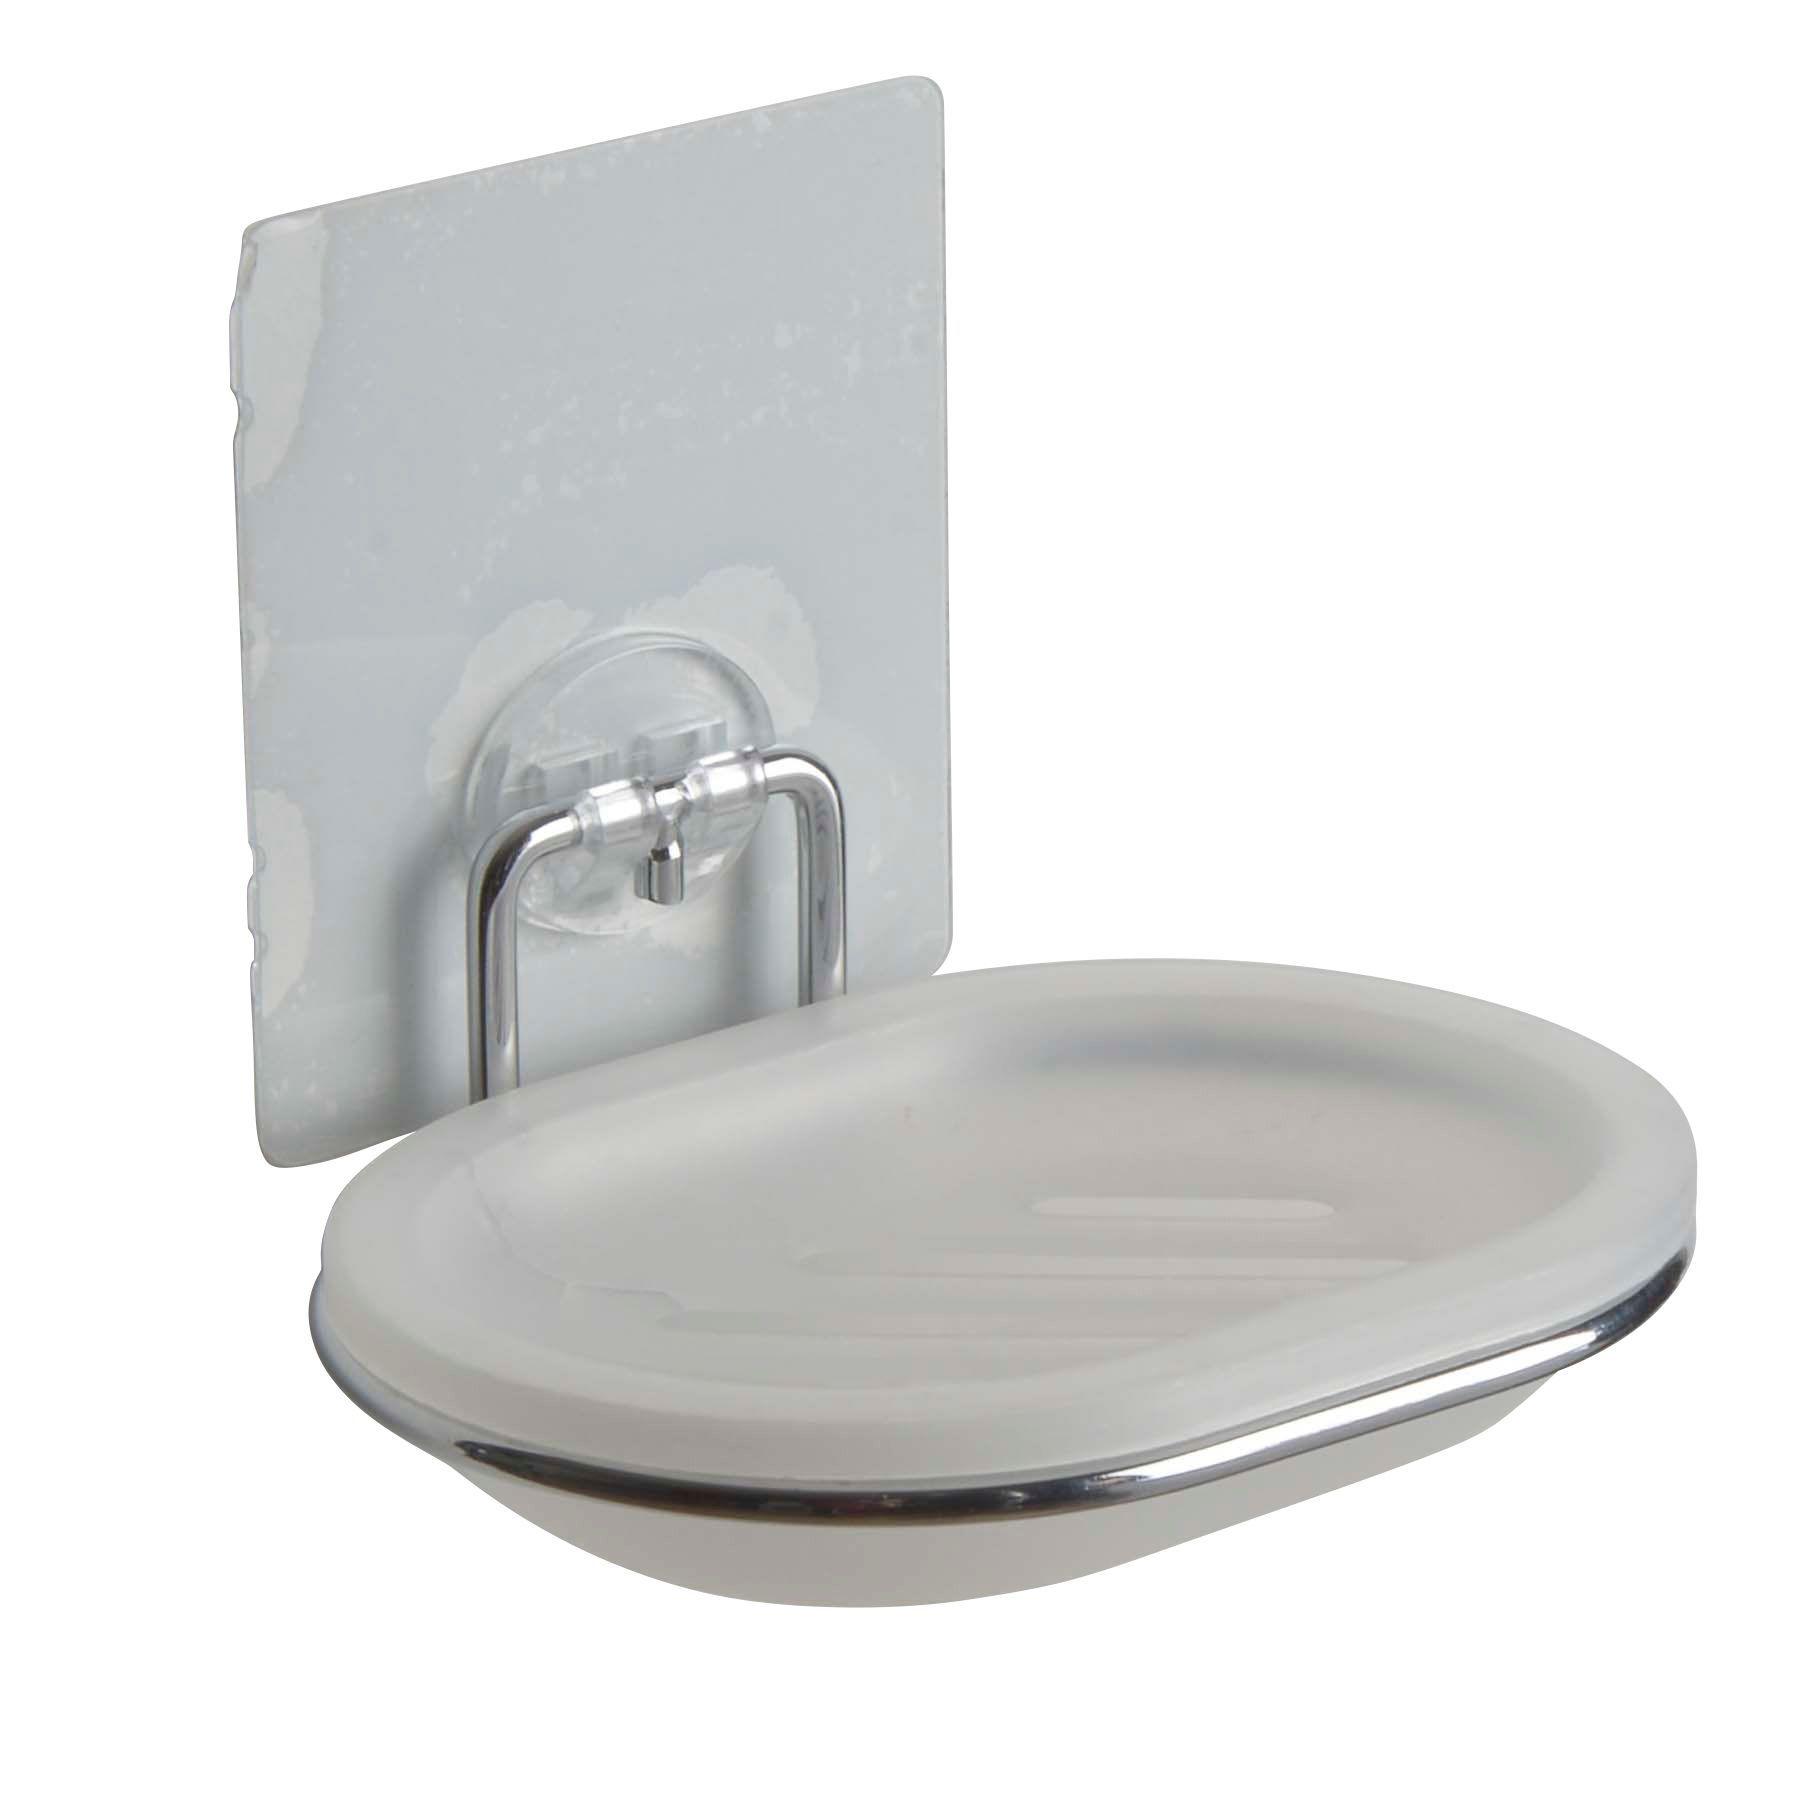 Bath Chrome Effect Wall Mounted Soap Dish